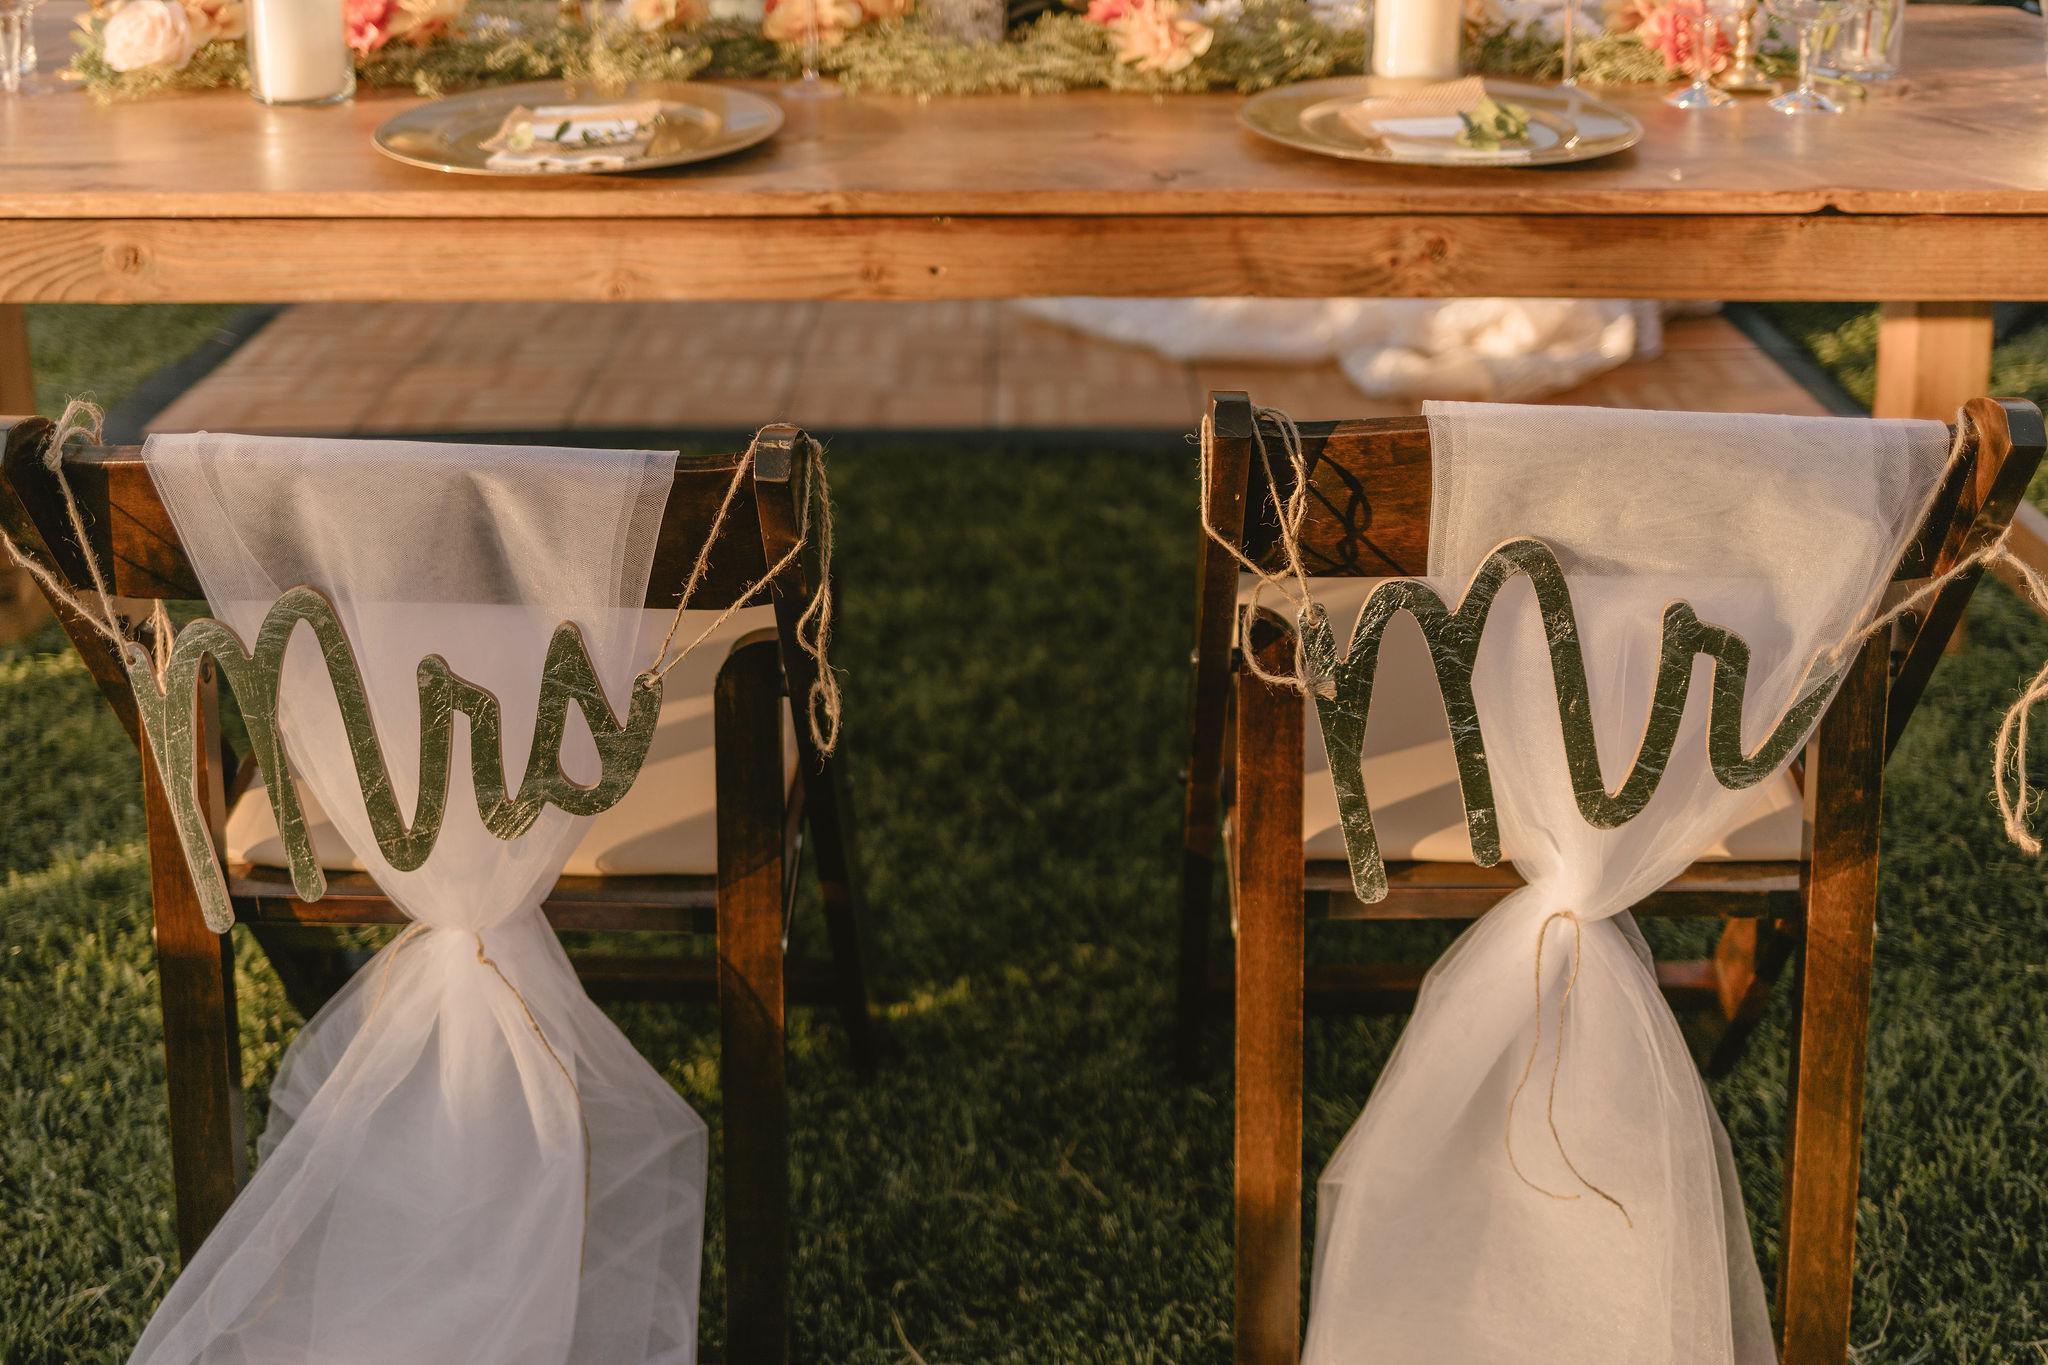 Minimalist Eco Friendly Wedding Table Decor Backyard Summer Wedding Princess Kaiulani Tabernero 2